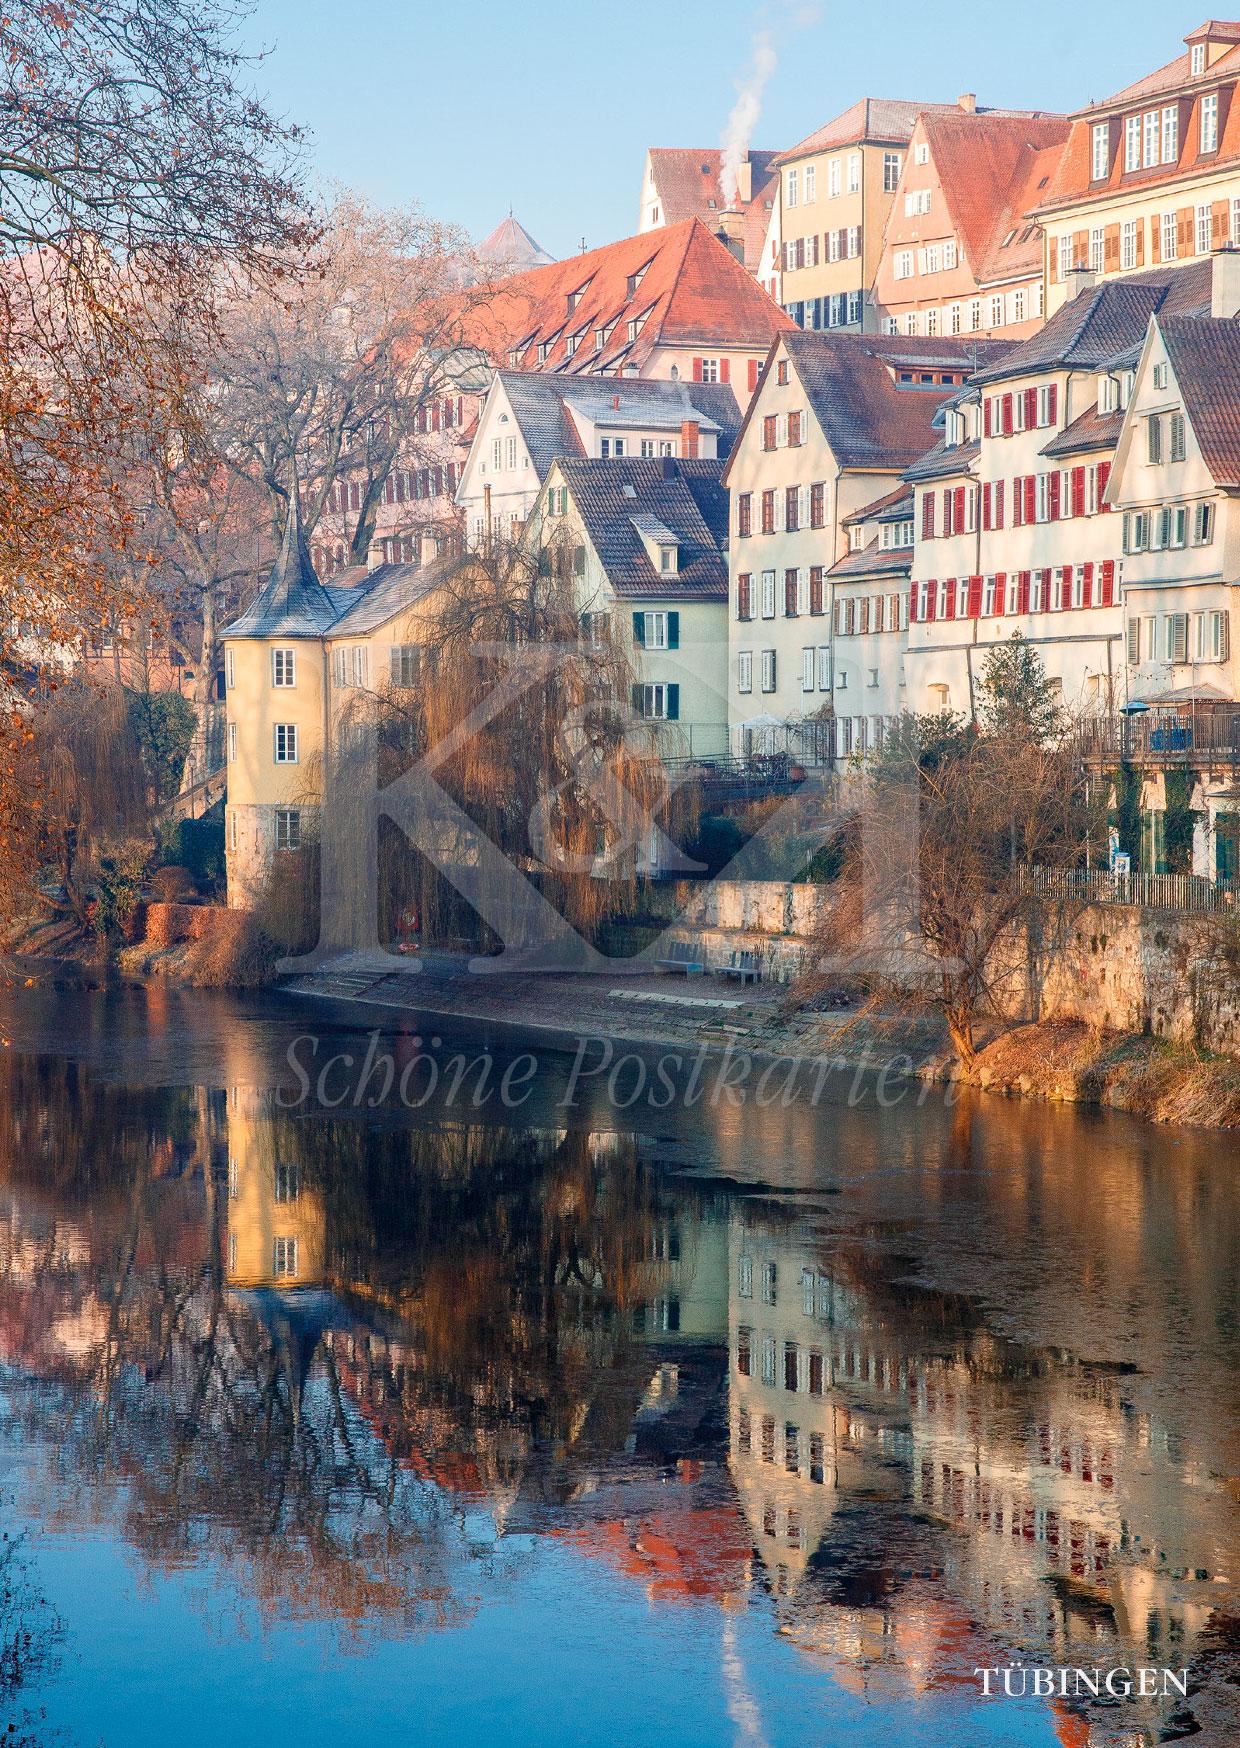 Schöne Postkarte Nr. 193 · Hölderlinturm in Tübingen im Winter © 2018